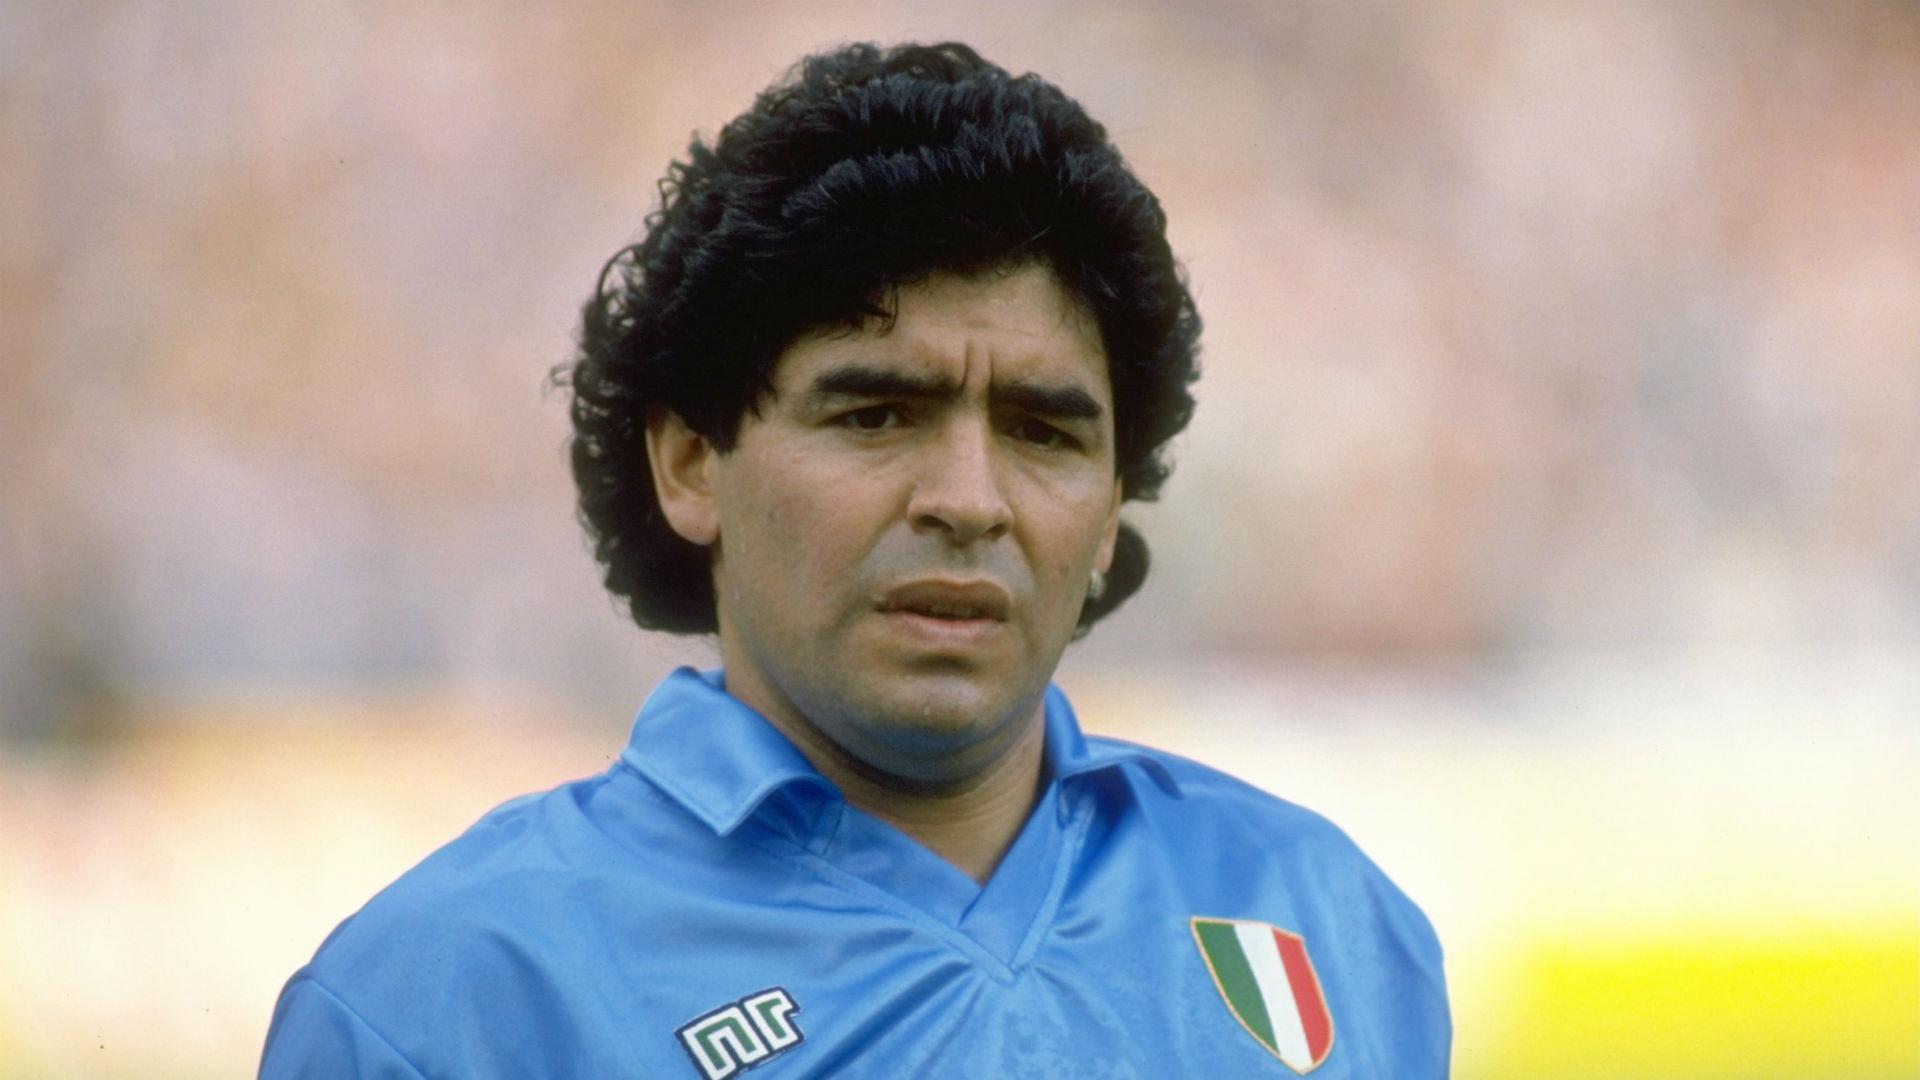 La police intervient, pas de plainte — Espagne-Dispute Maradona